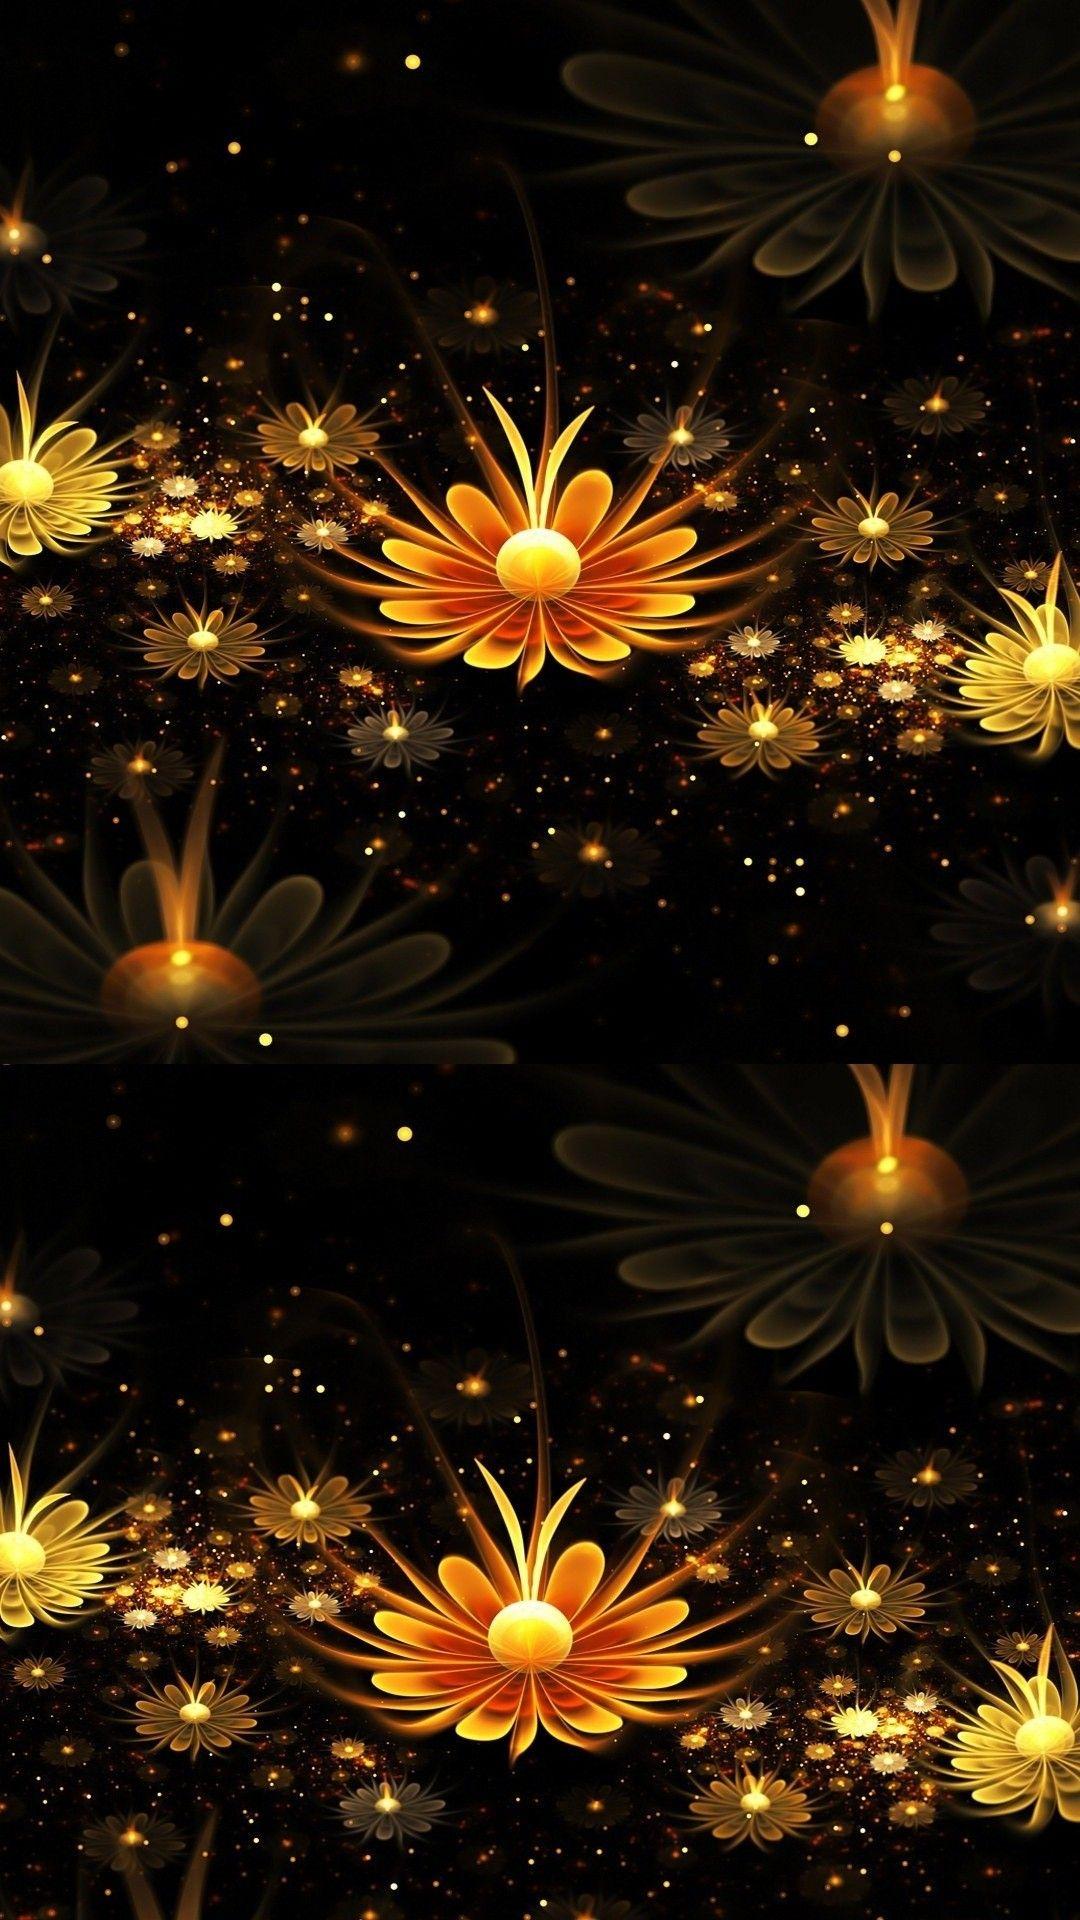 Flower Wallpaper For Android Mobile